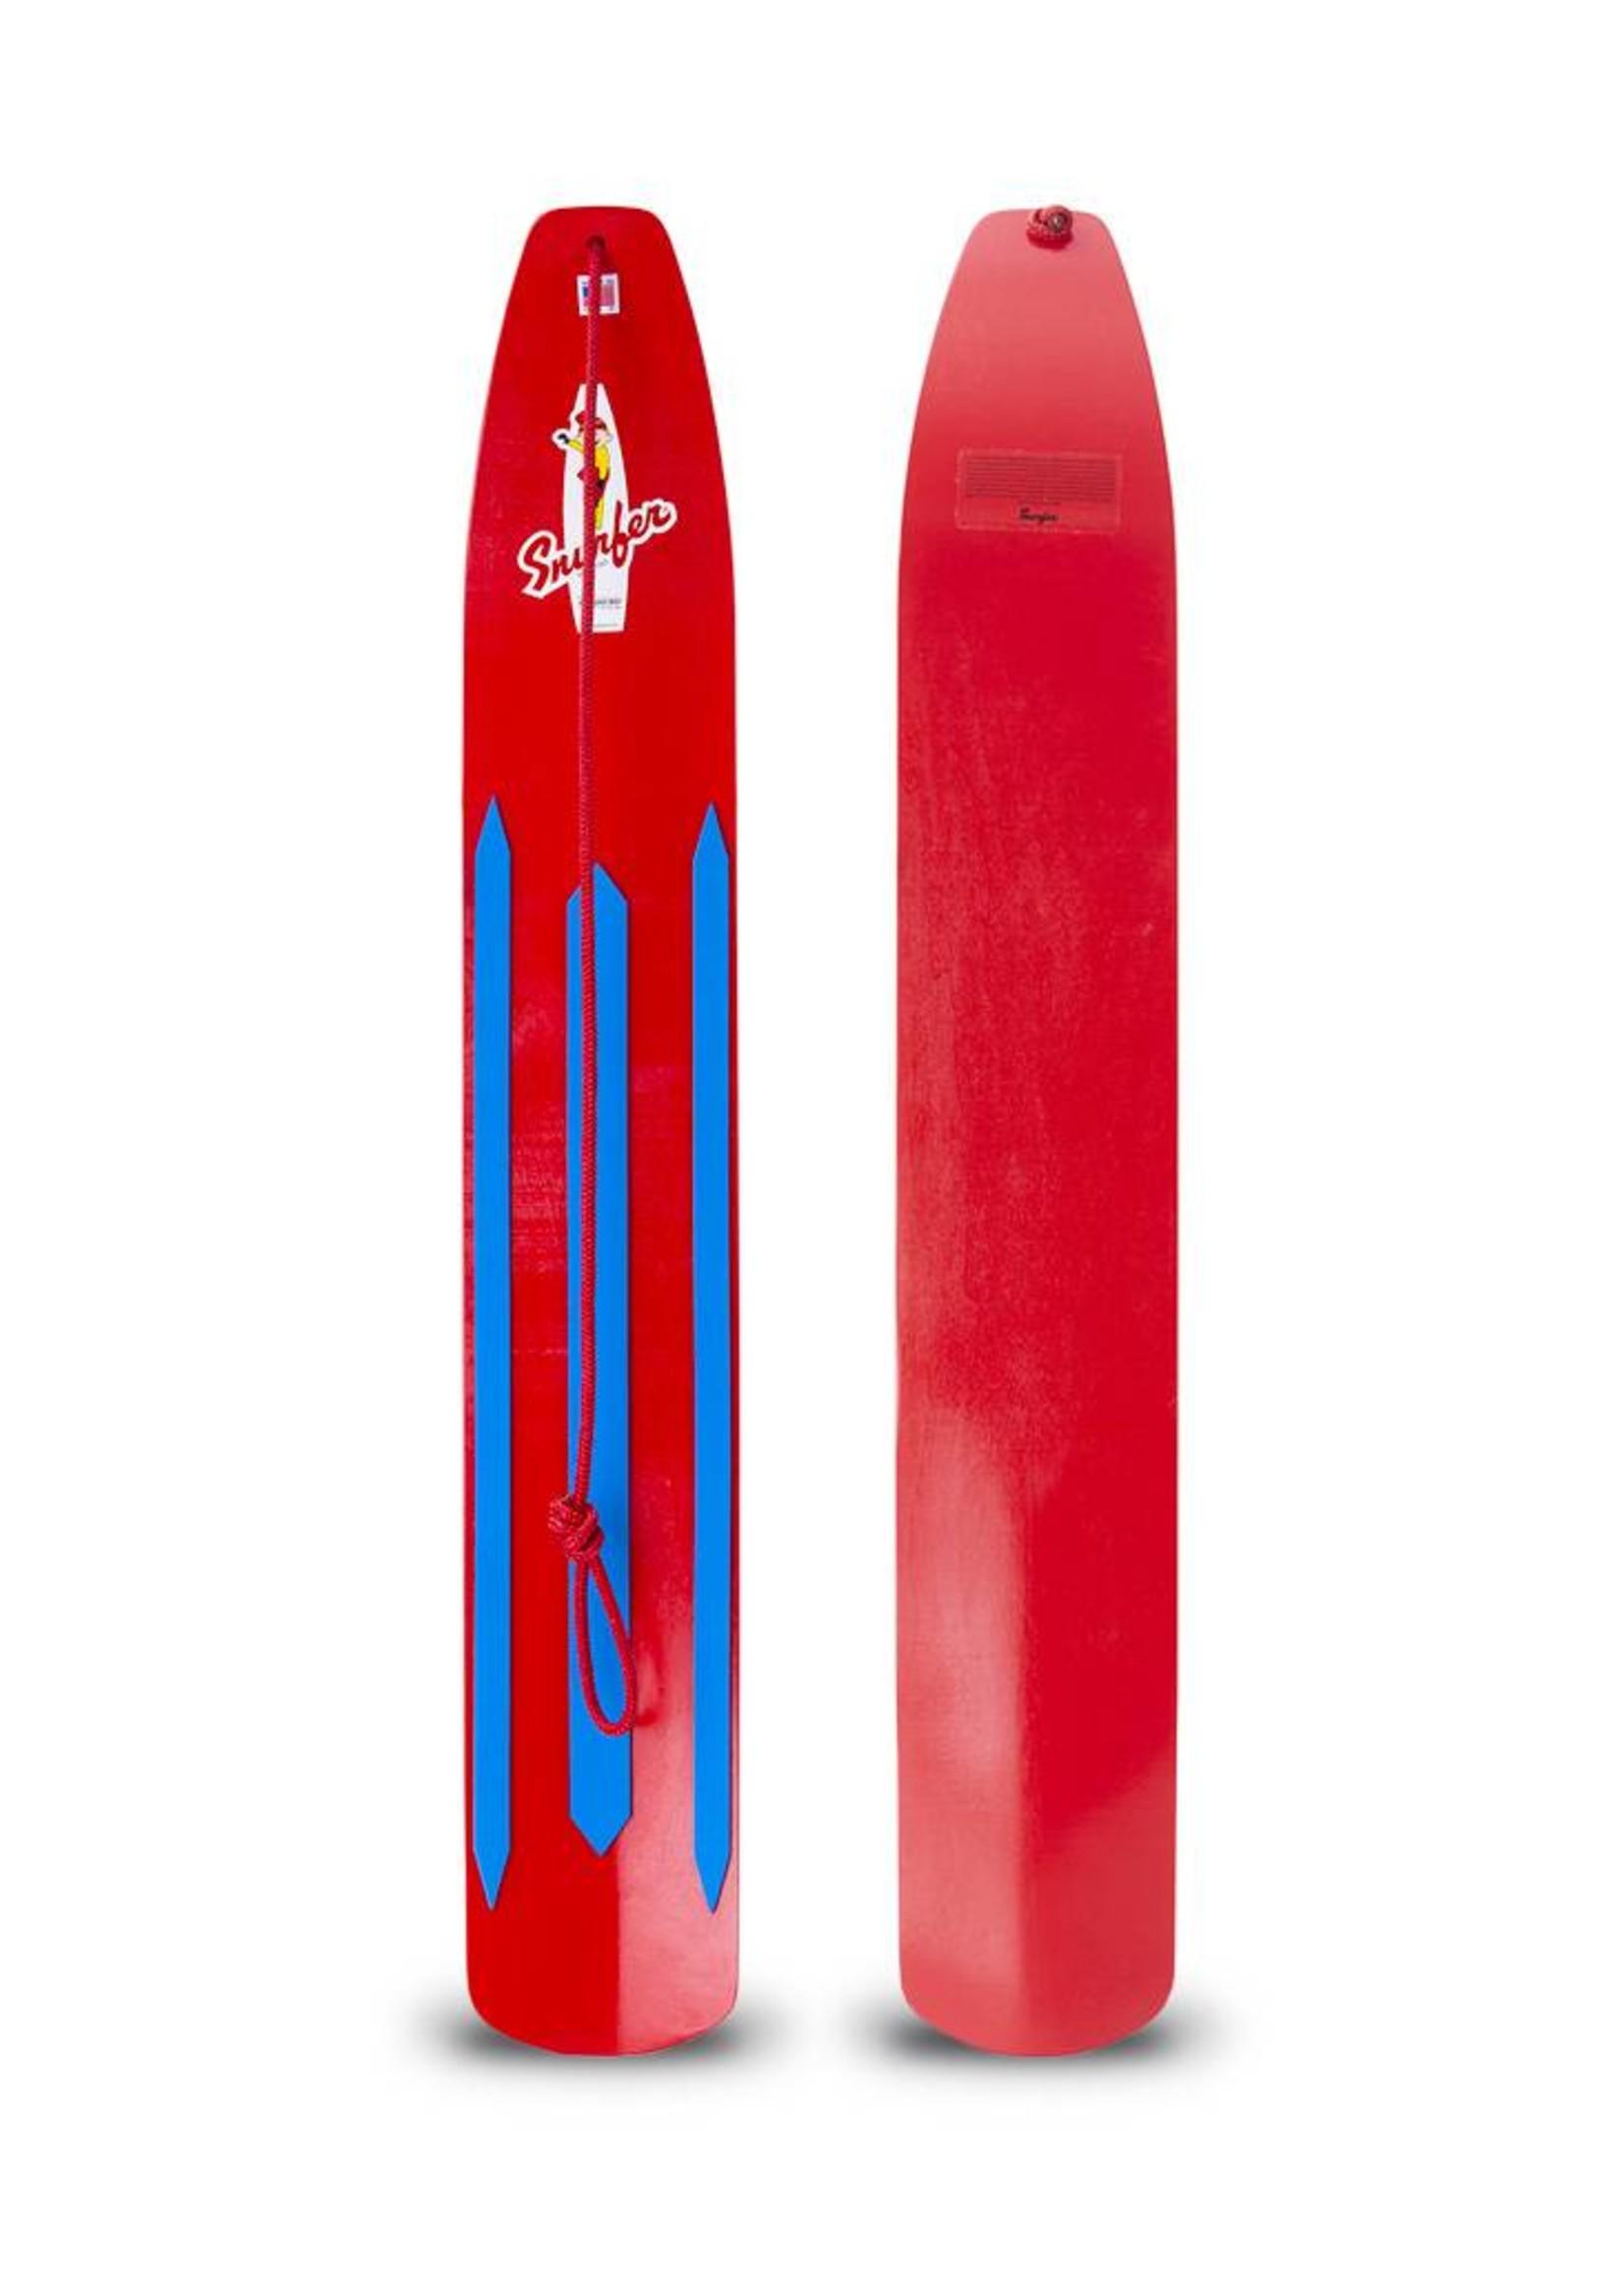 Snurfer Snurfer The Classic Rocket Snow Surfer Red